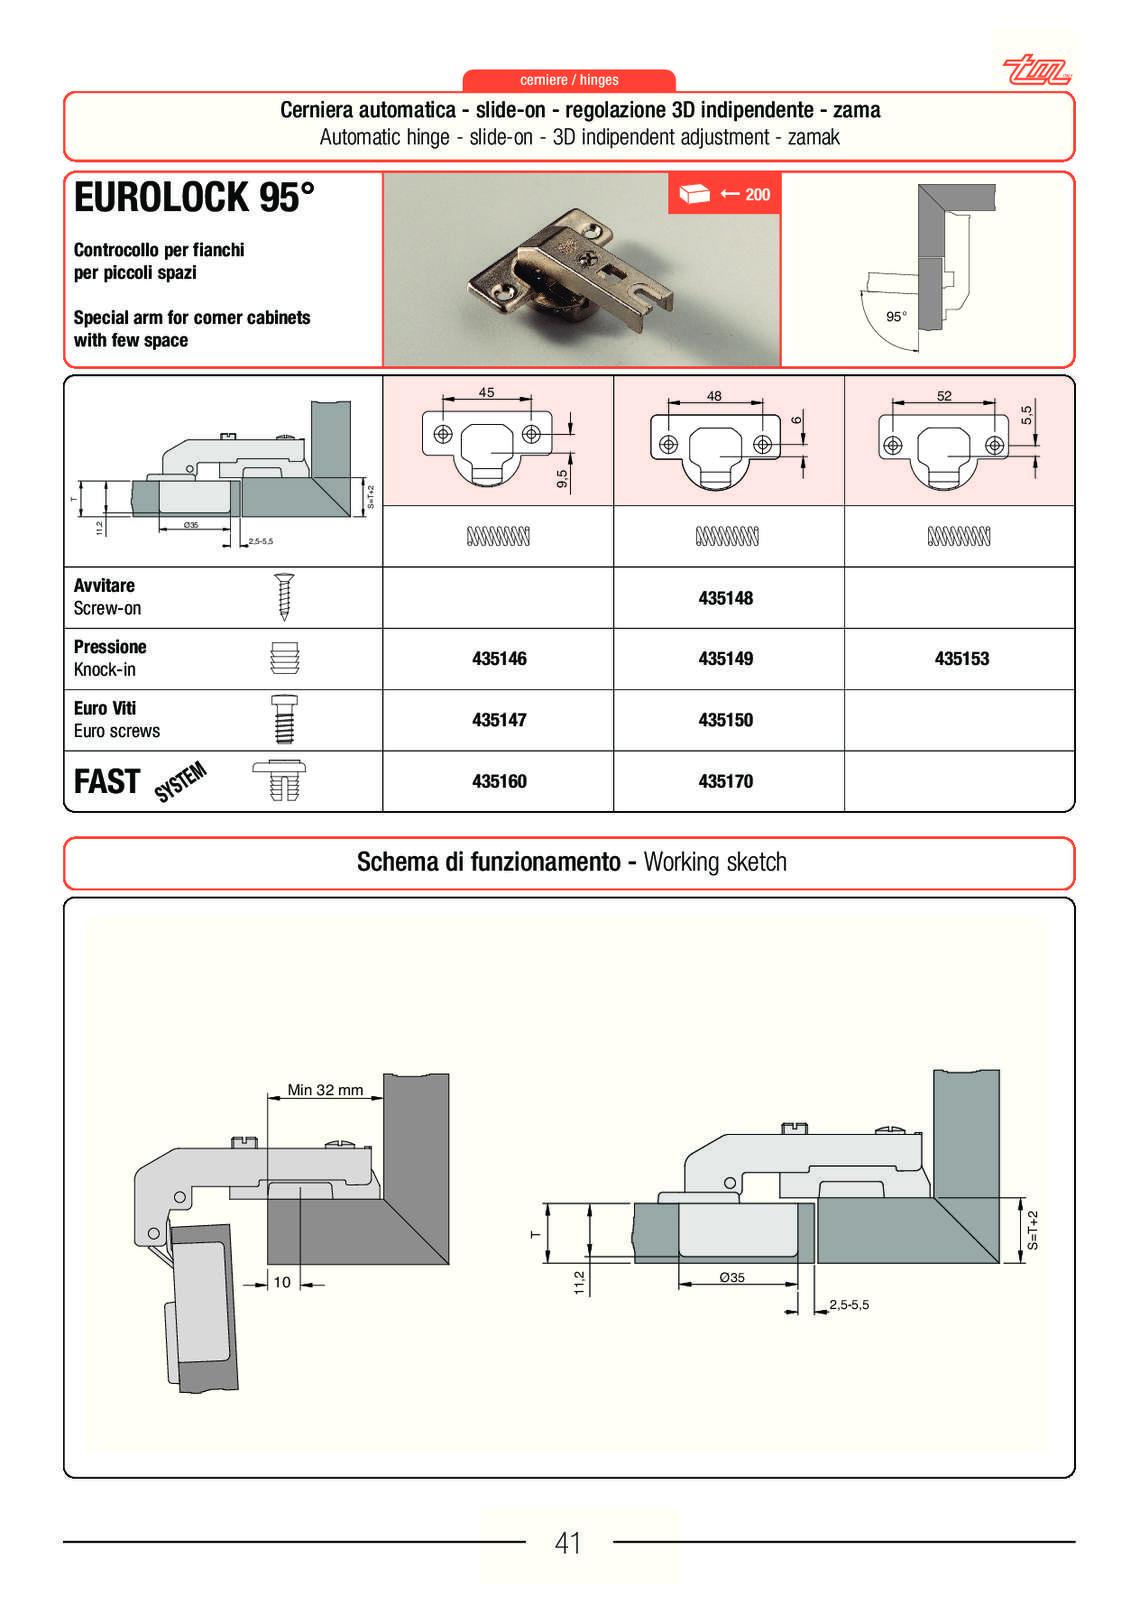 euro-hinges-catalogue_175_040.jpg